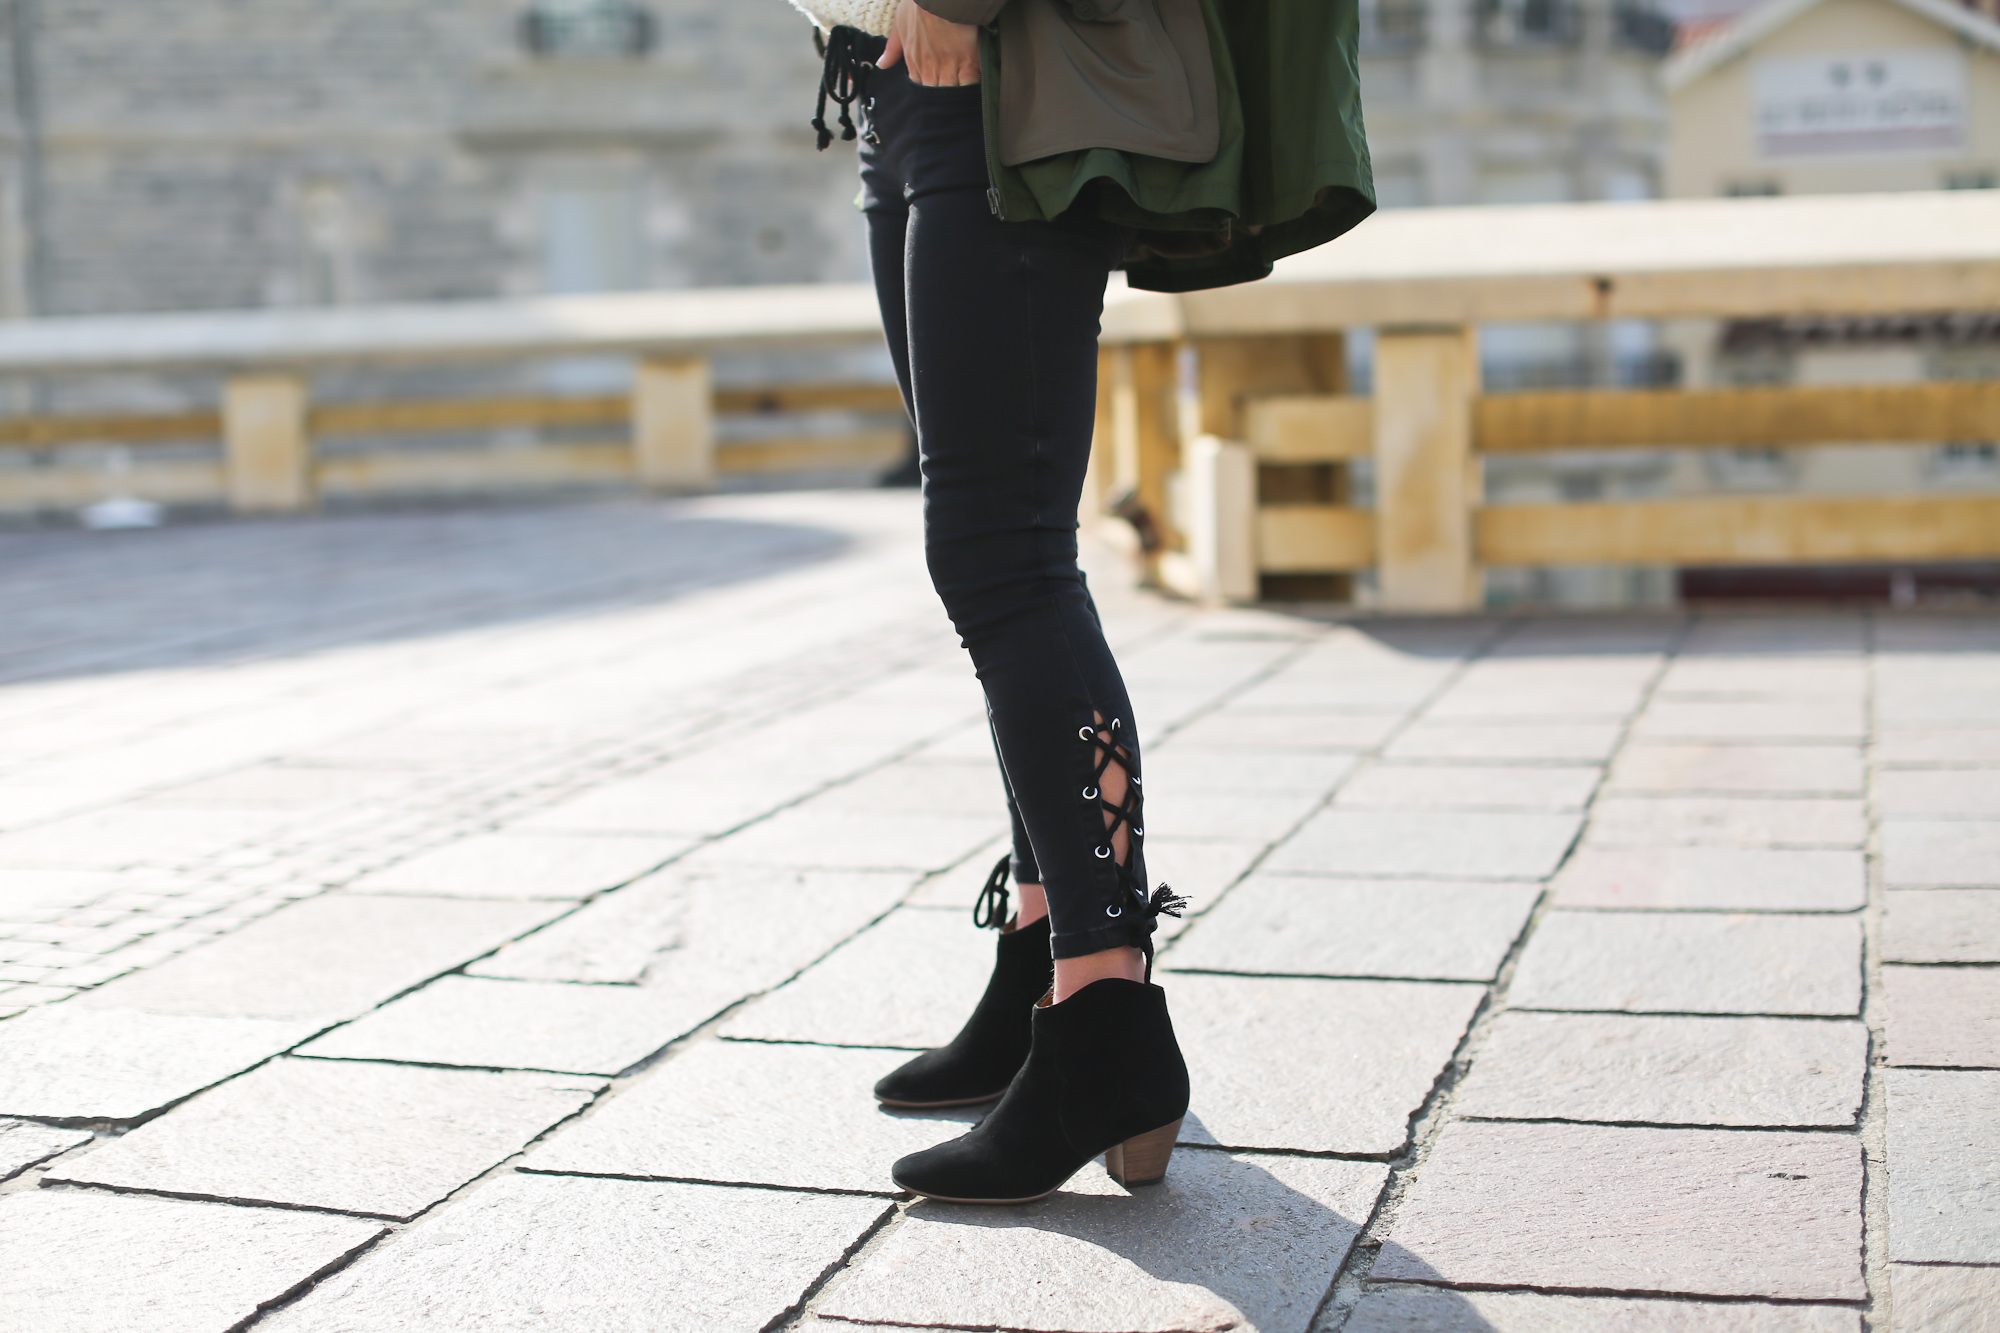 Clochet_streetstyle_h&mstudio_parka_isabelmarant_dicker_boots-7